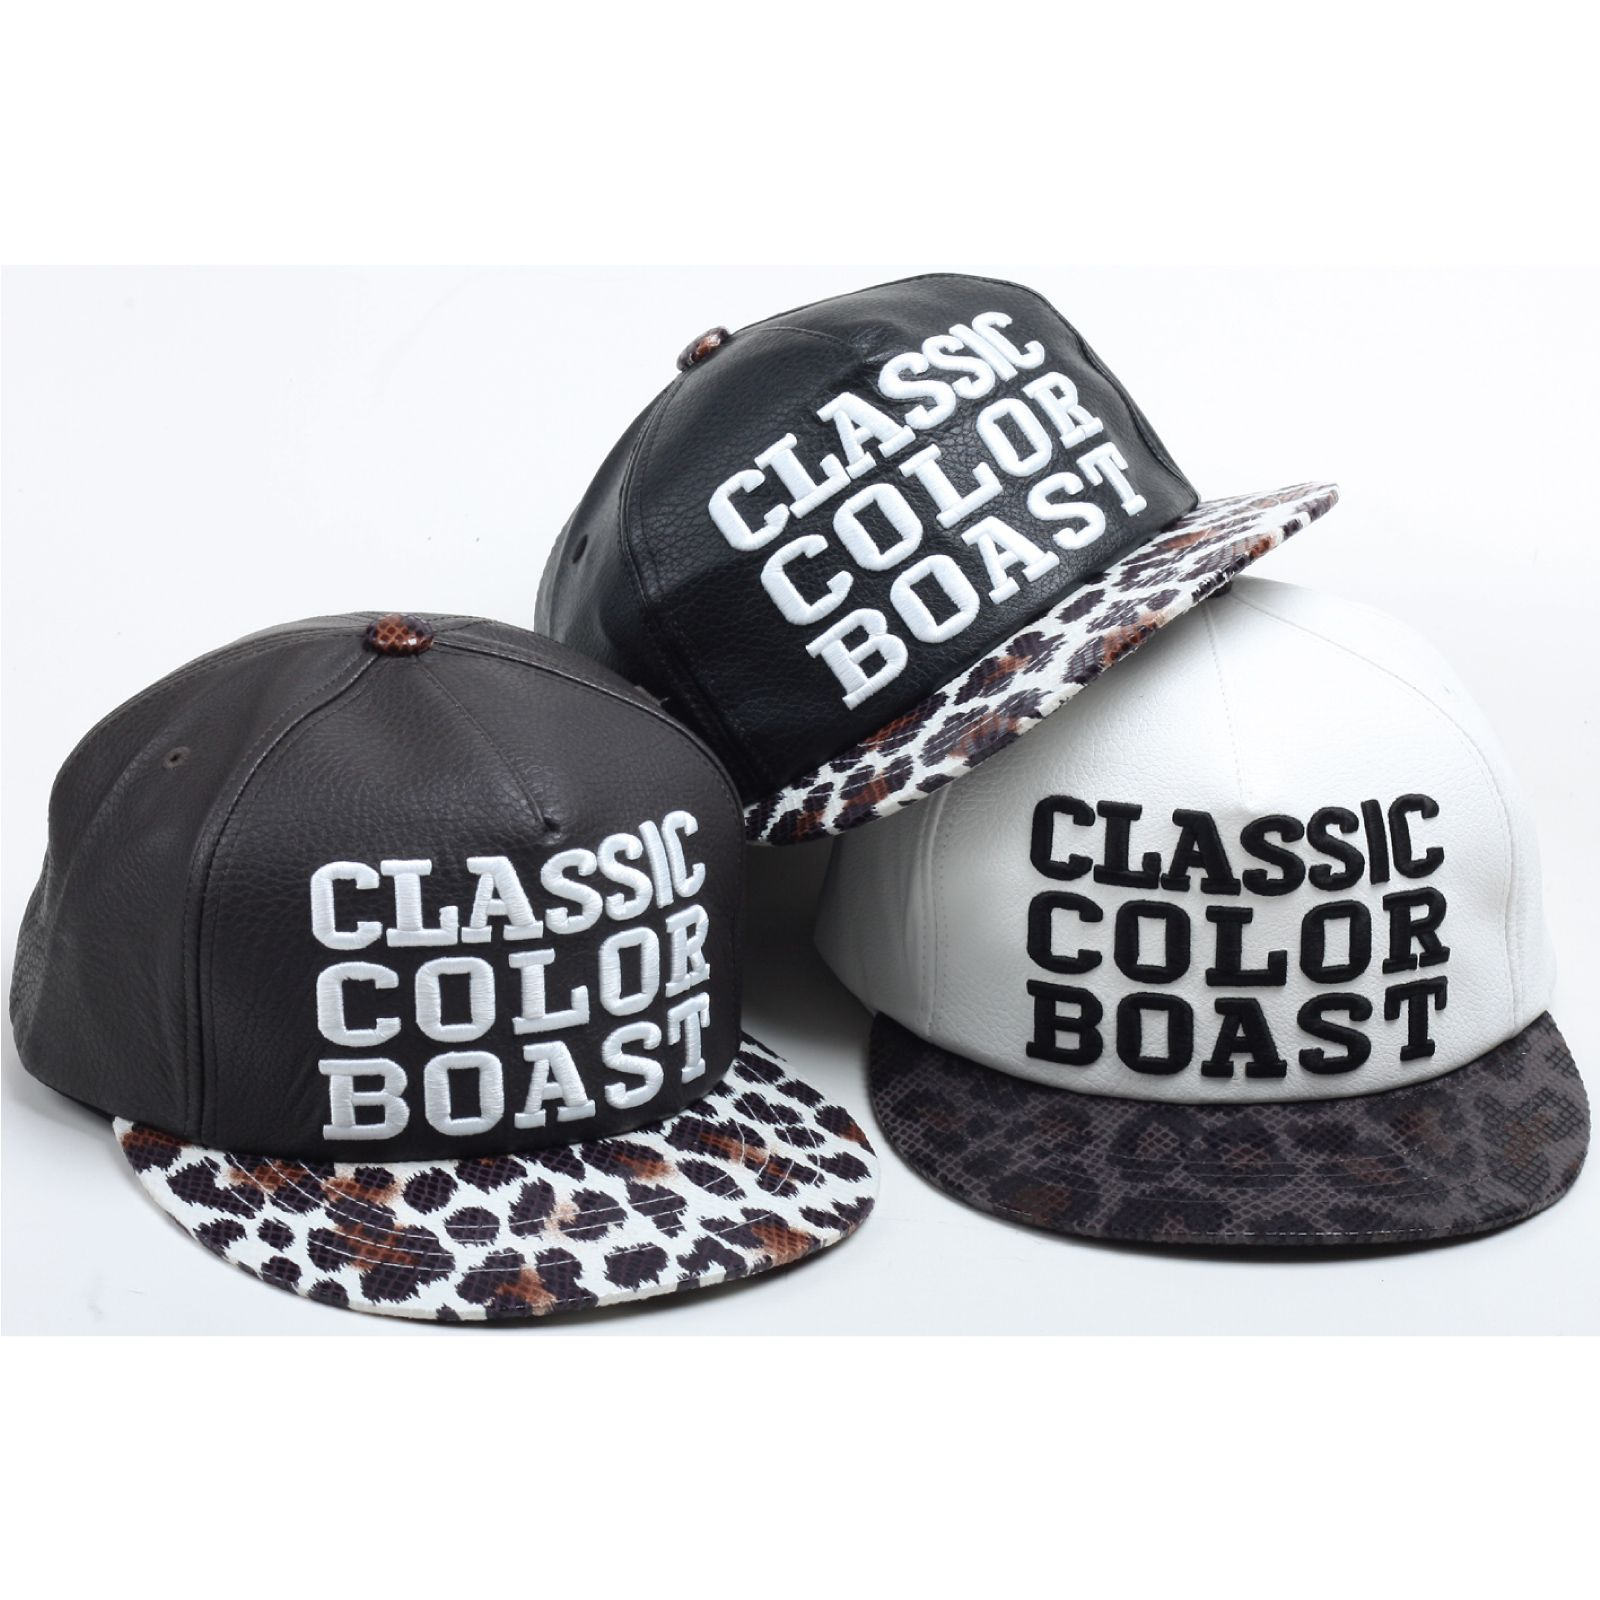 19f3296c H53 Faux Snake Skin Leopard Leather Brim Club Cap HipHop Bill Snapback Flat  Hat